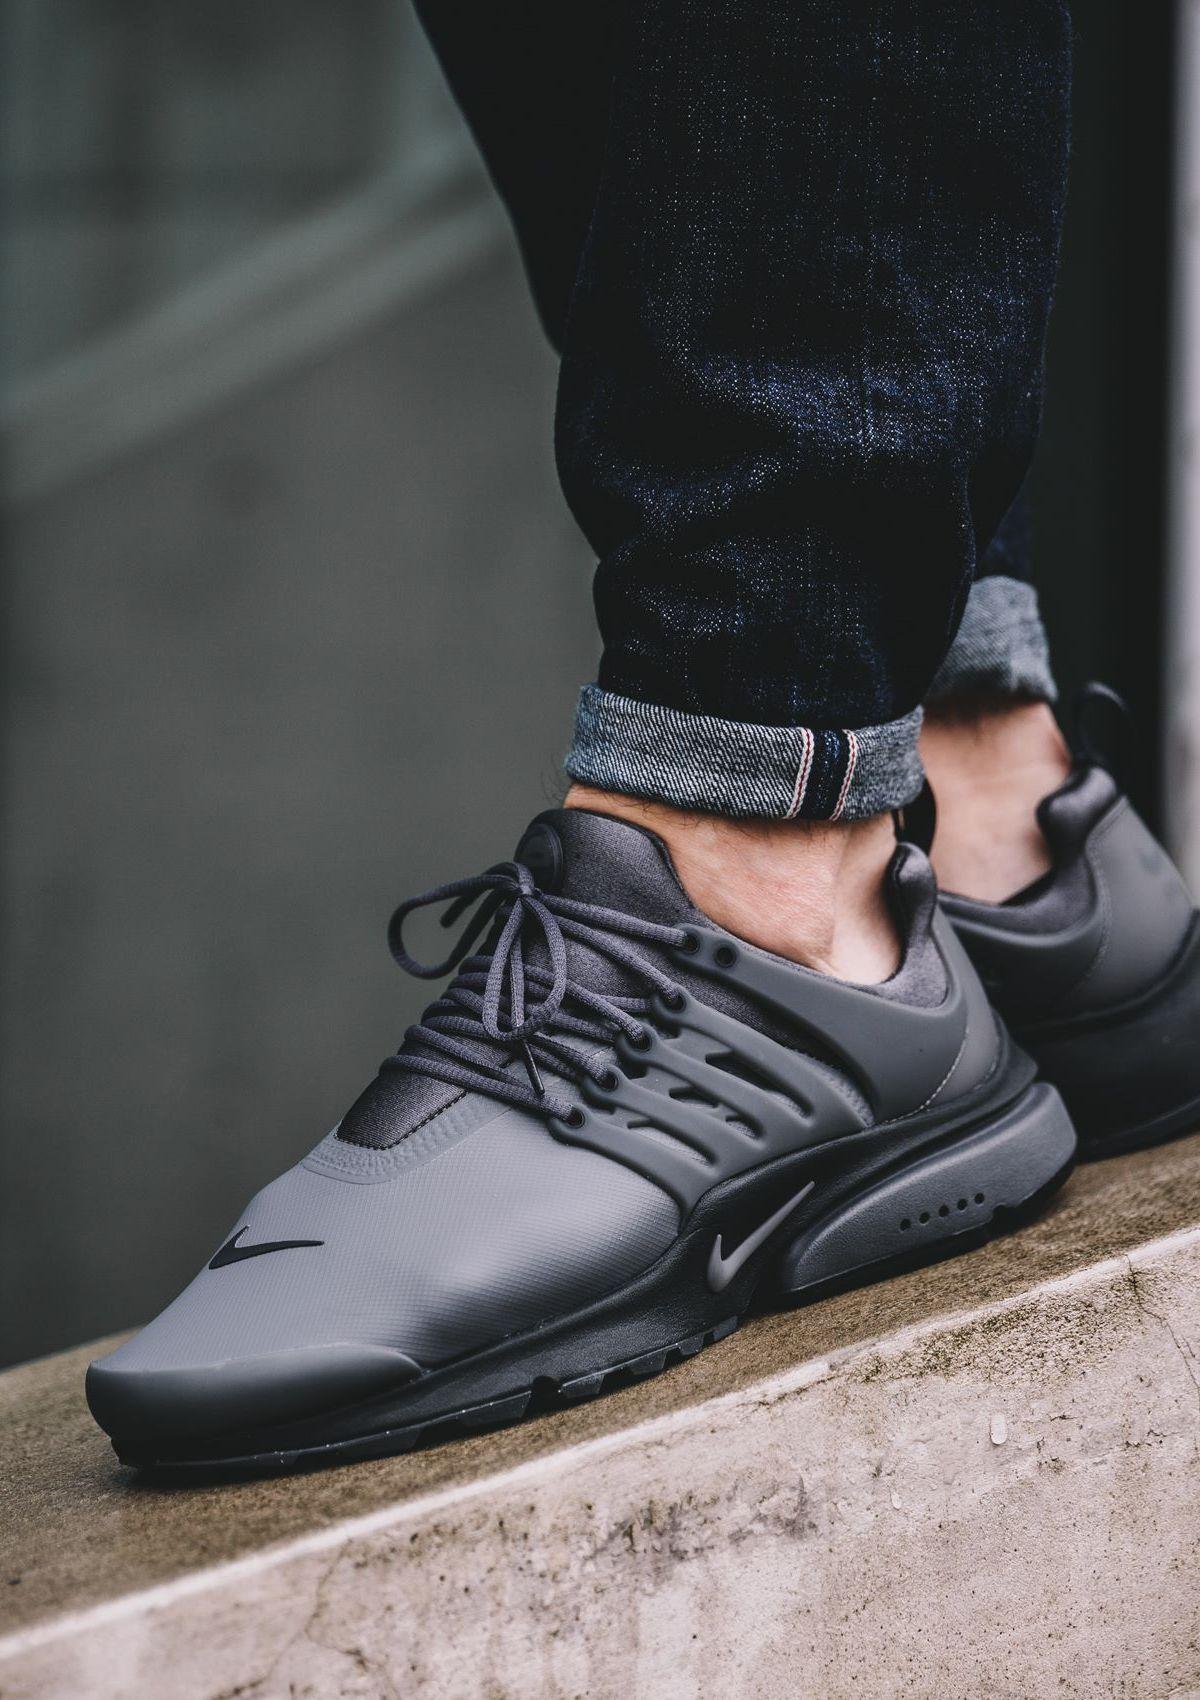 reputable site 8a61f ae3cb ... Nike Air Presto Low Utility grey sneakernews Sneakers StreetStyle Kicks  ...